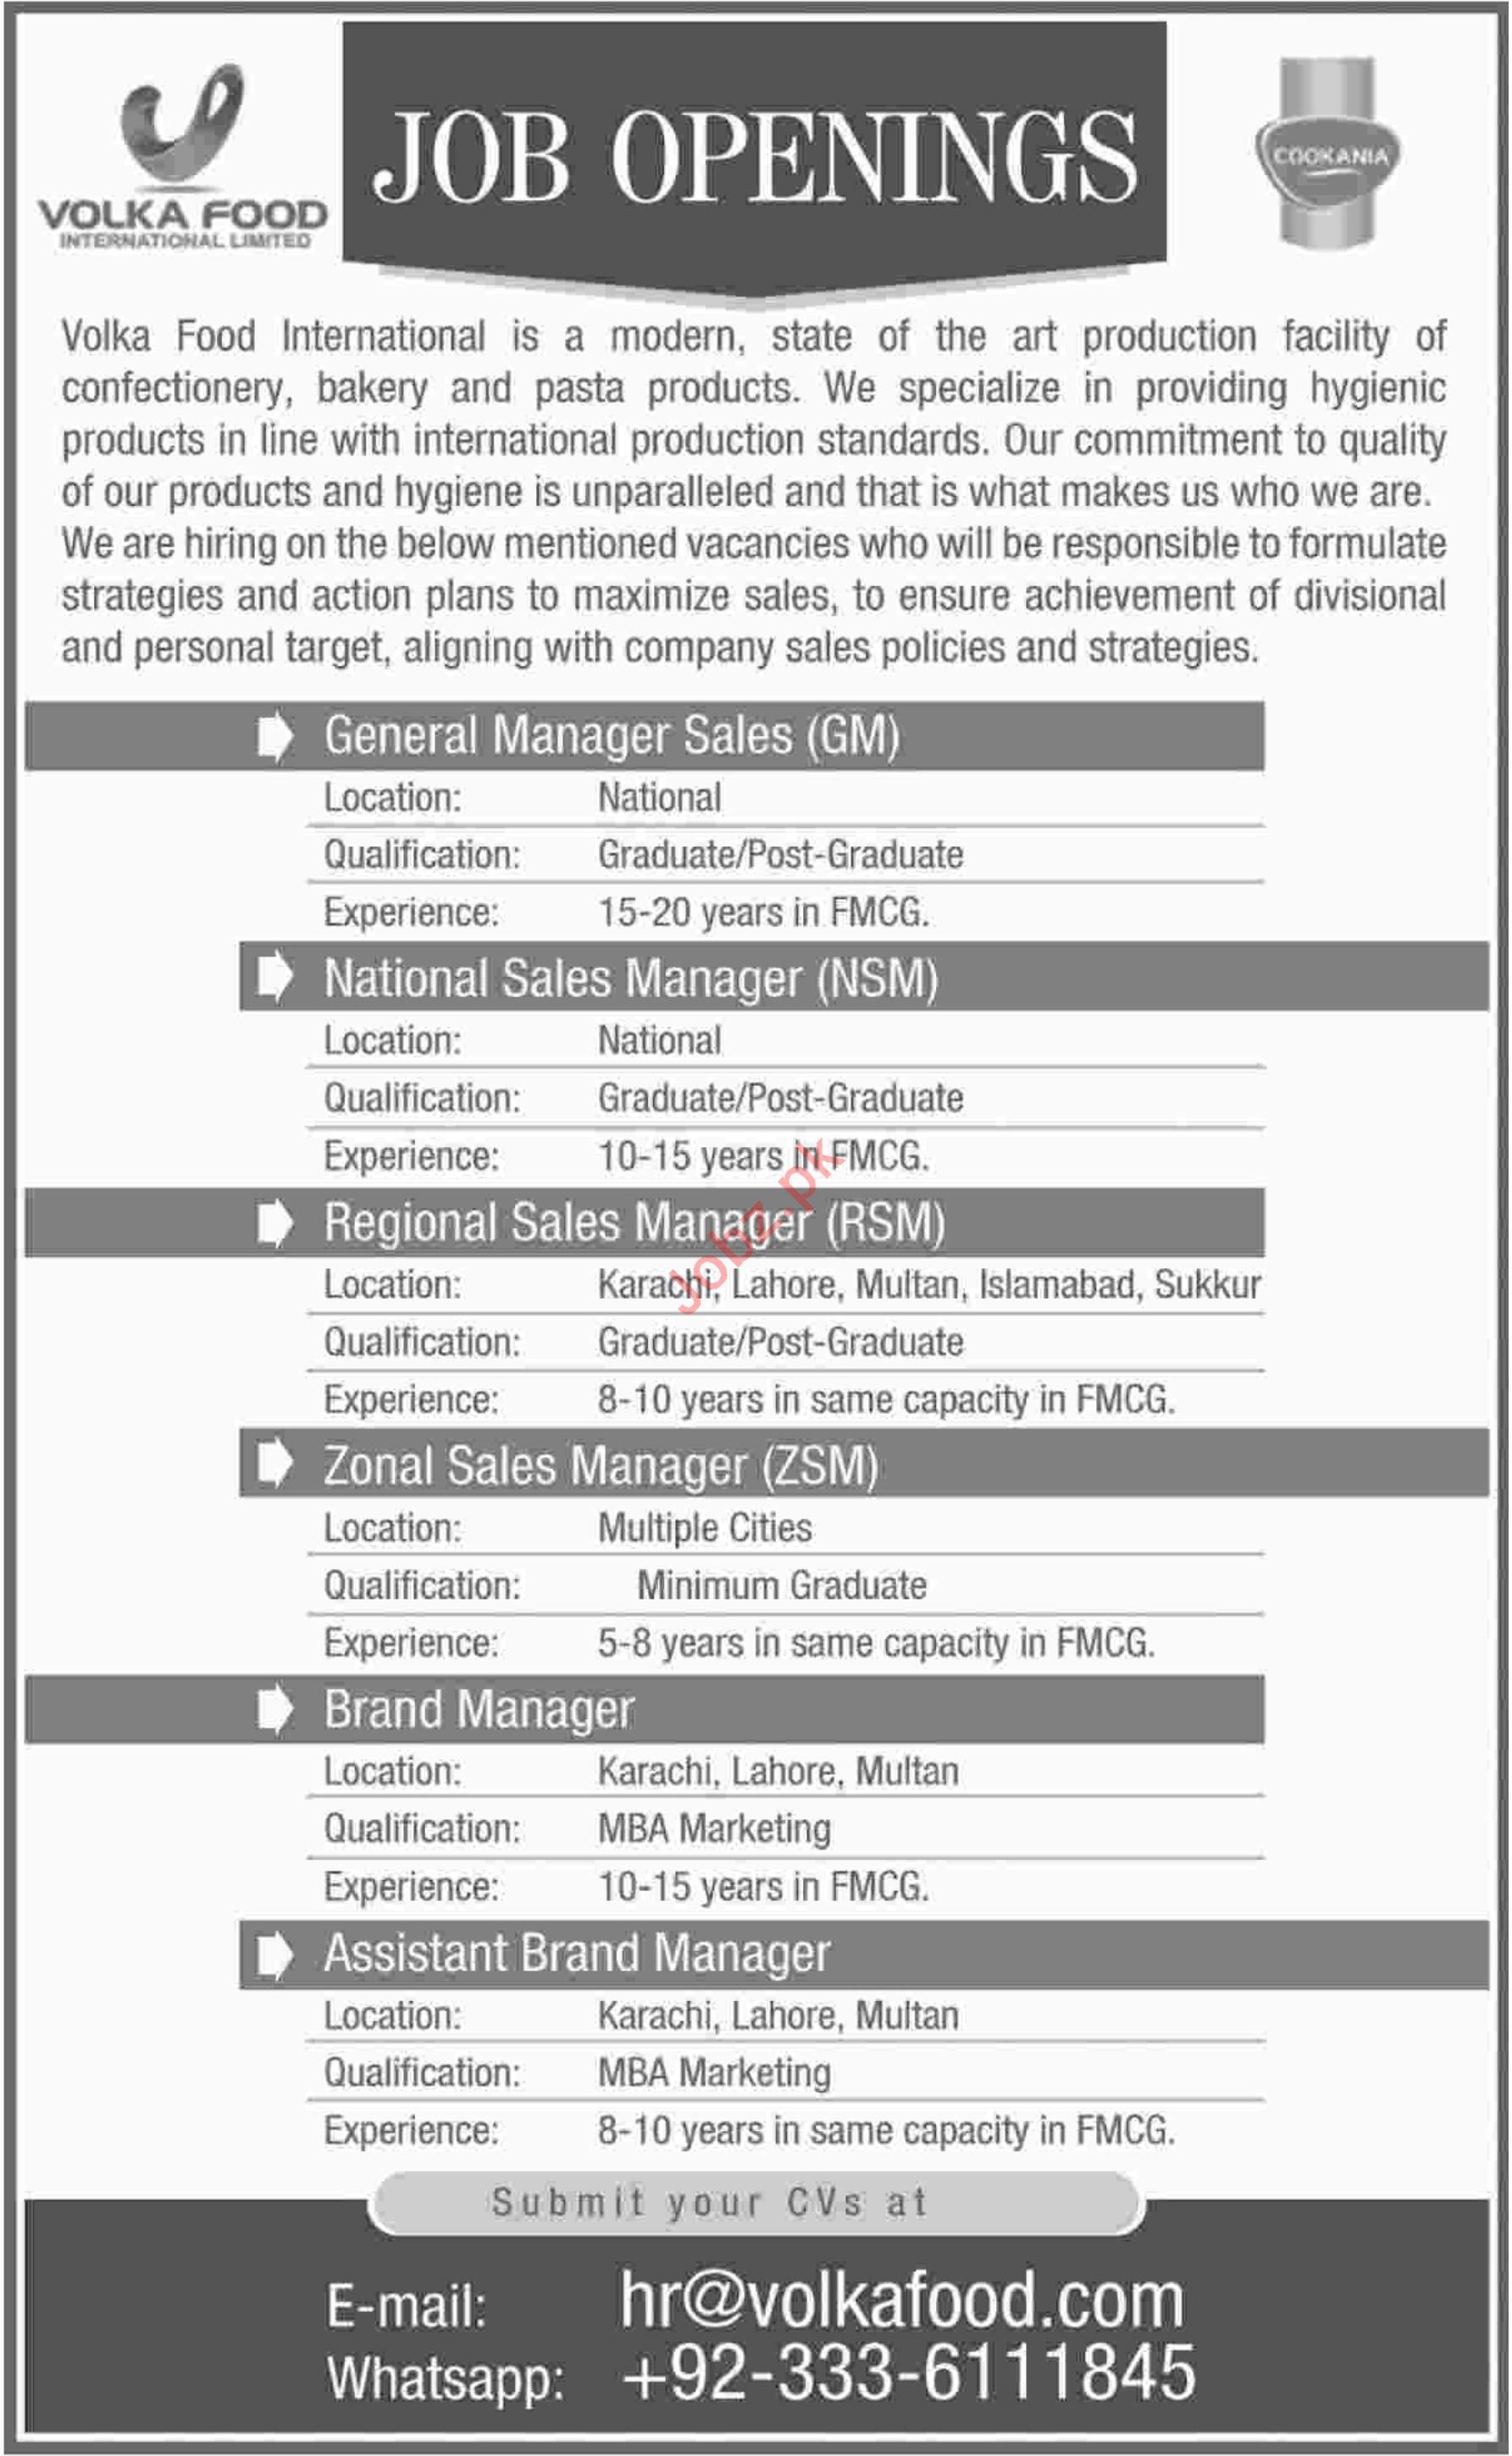 General Manager Sales Jobs at Volka Foods